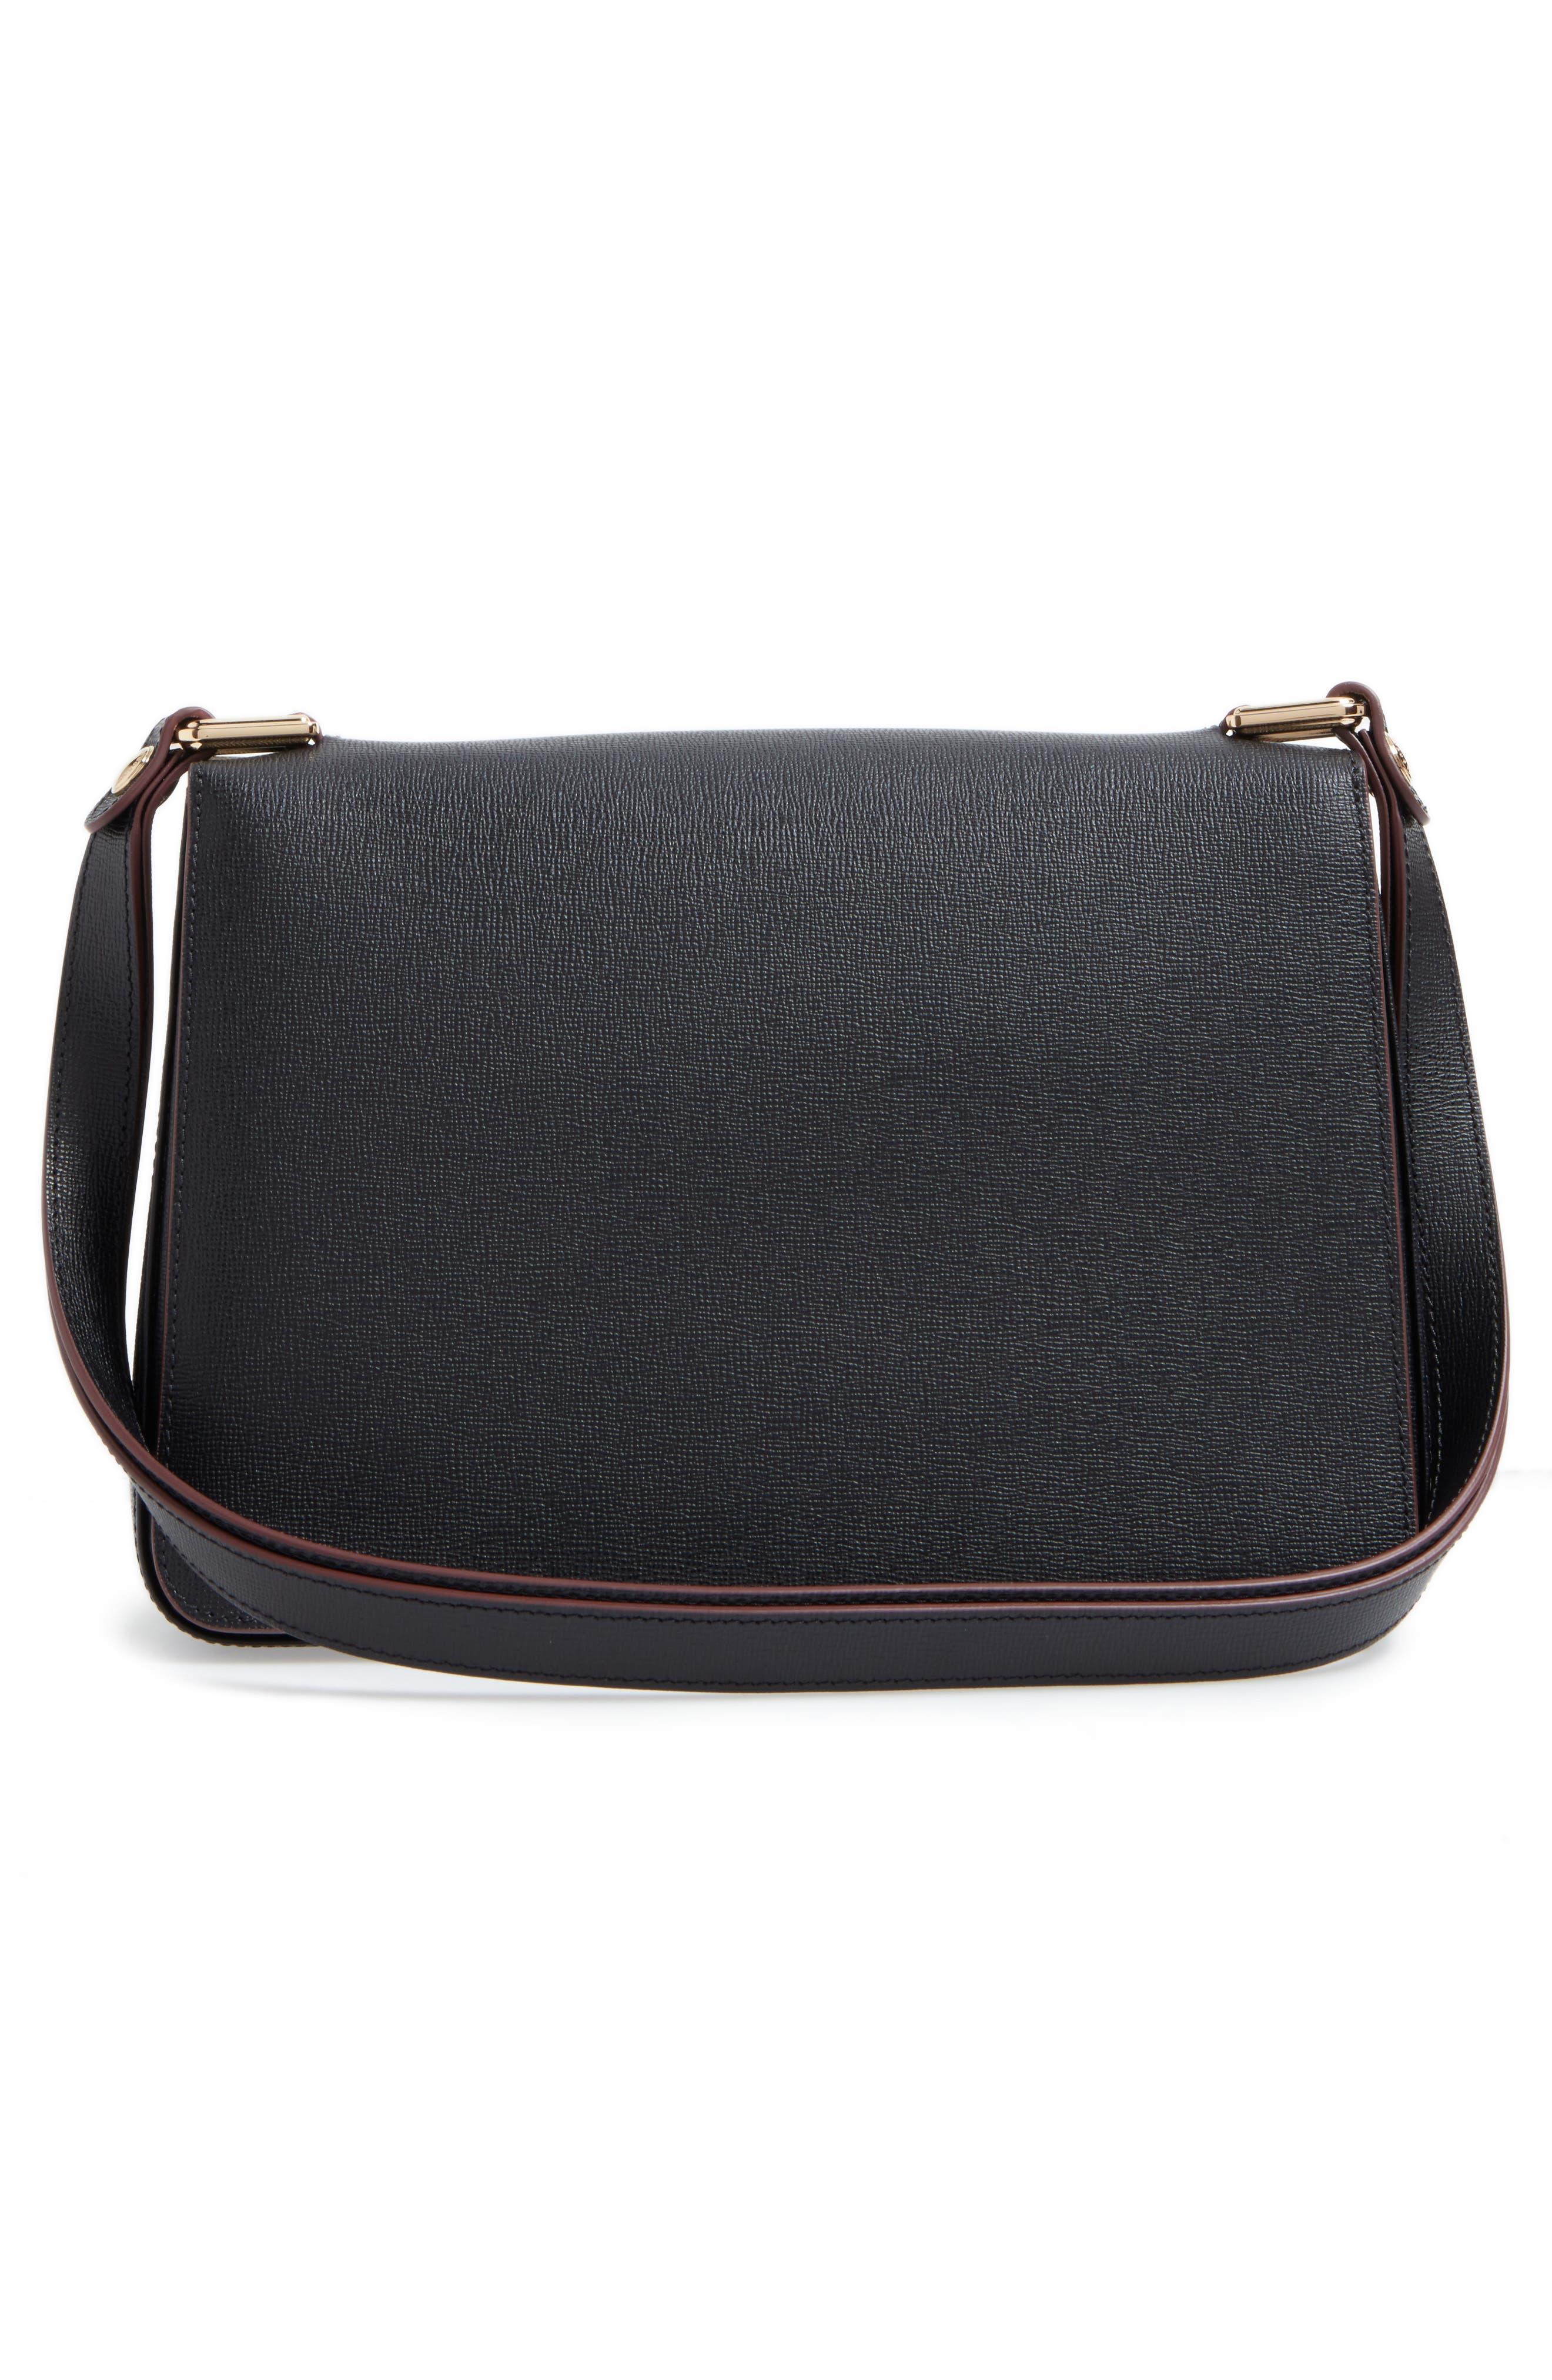 Alternate Image 3  - Longchamp Pliage Heritage Leather Shoulder Bag